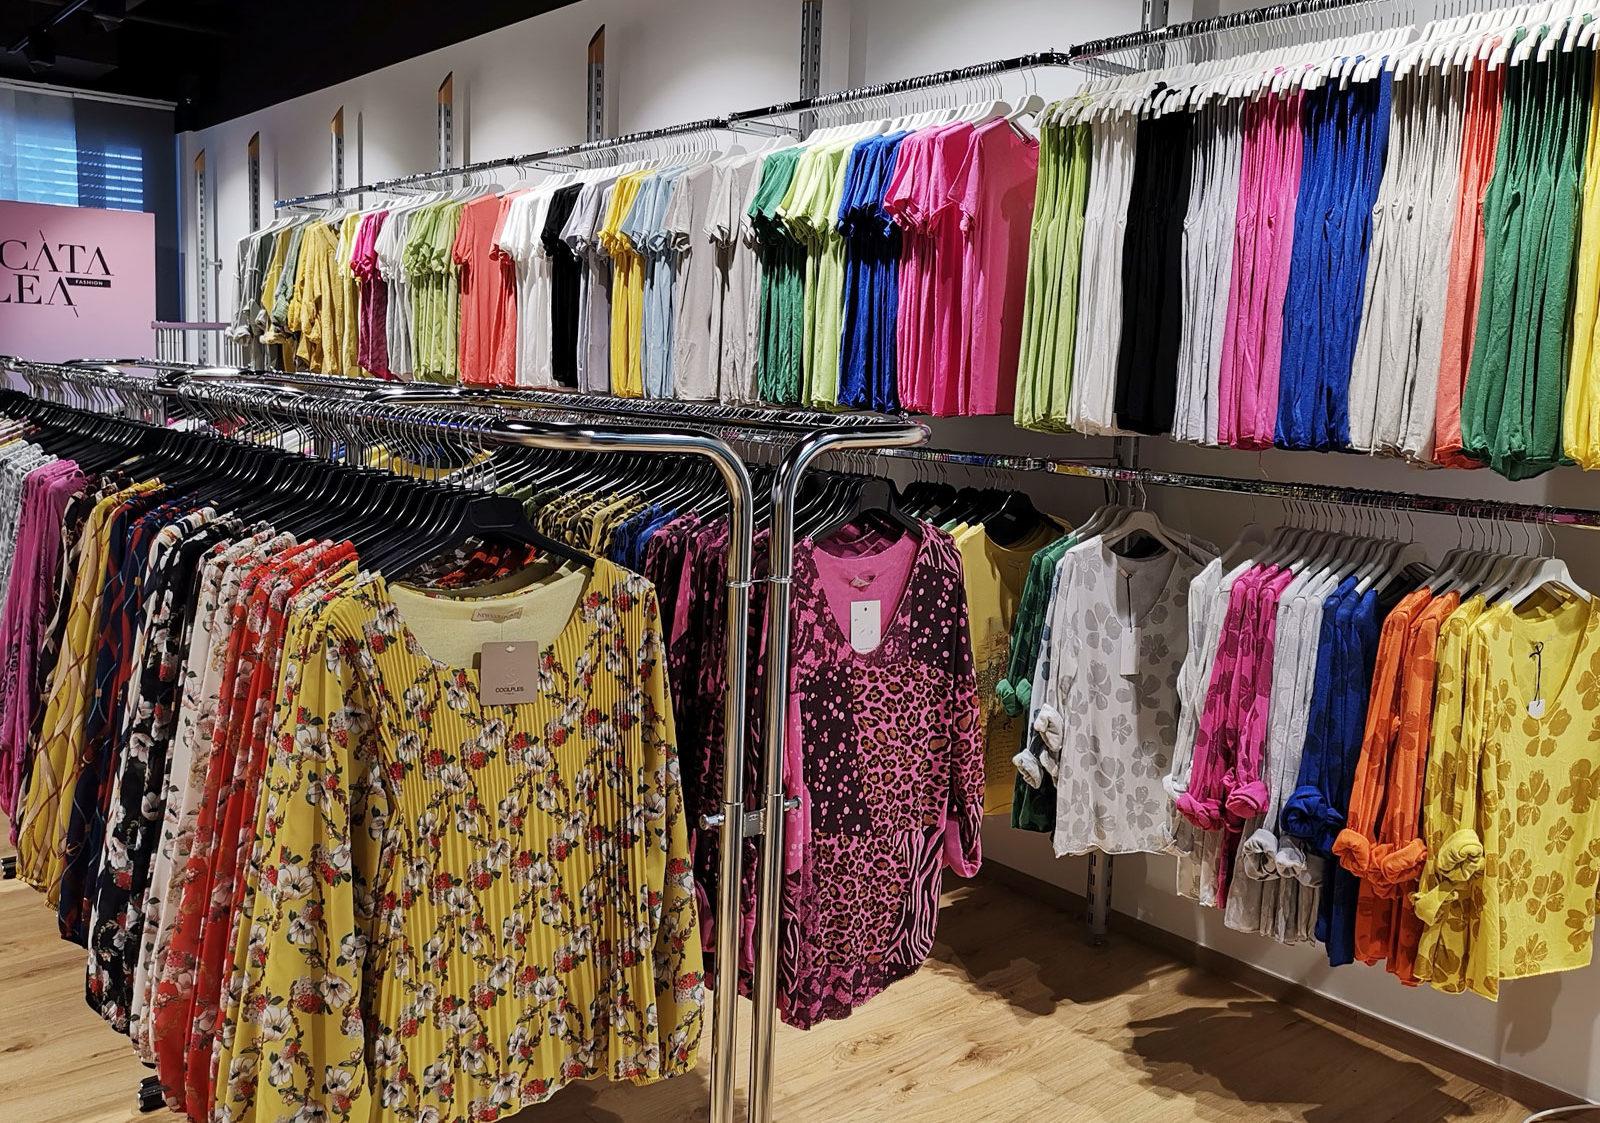 Catalea_Fashion_Showroom_002_web